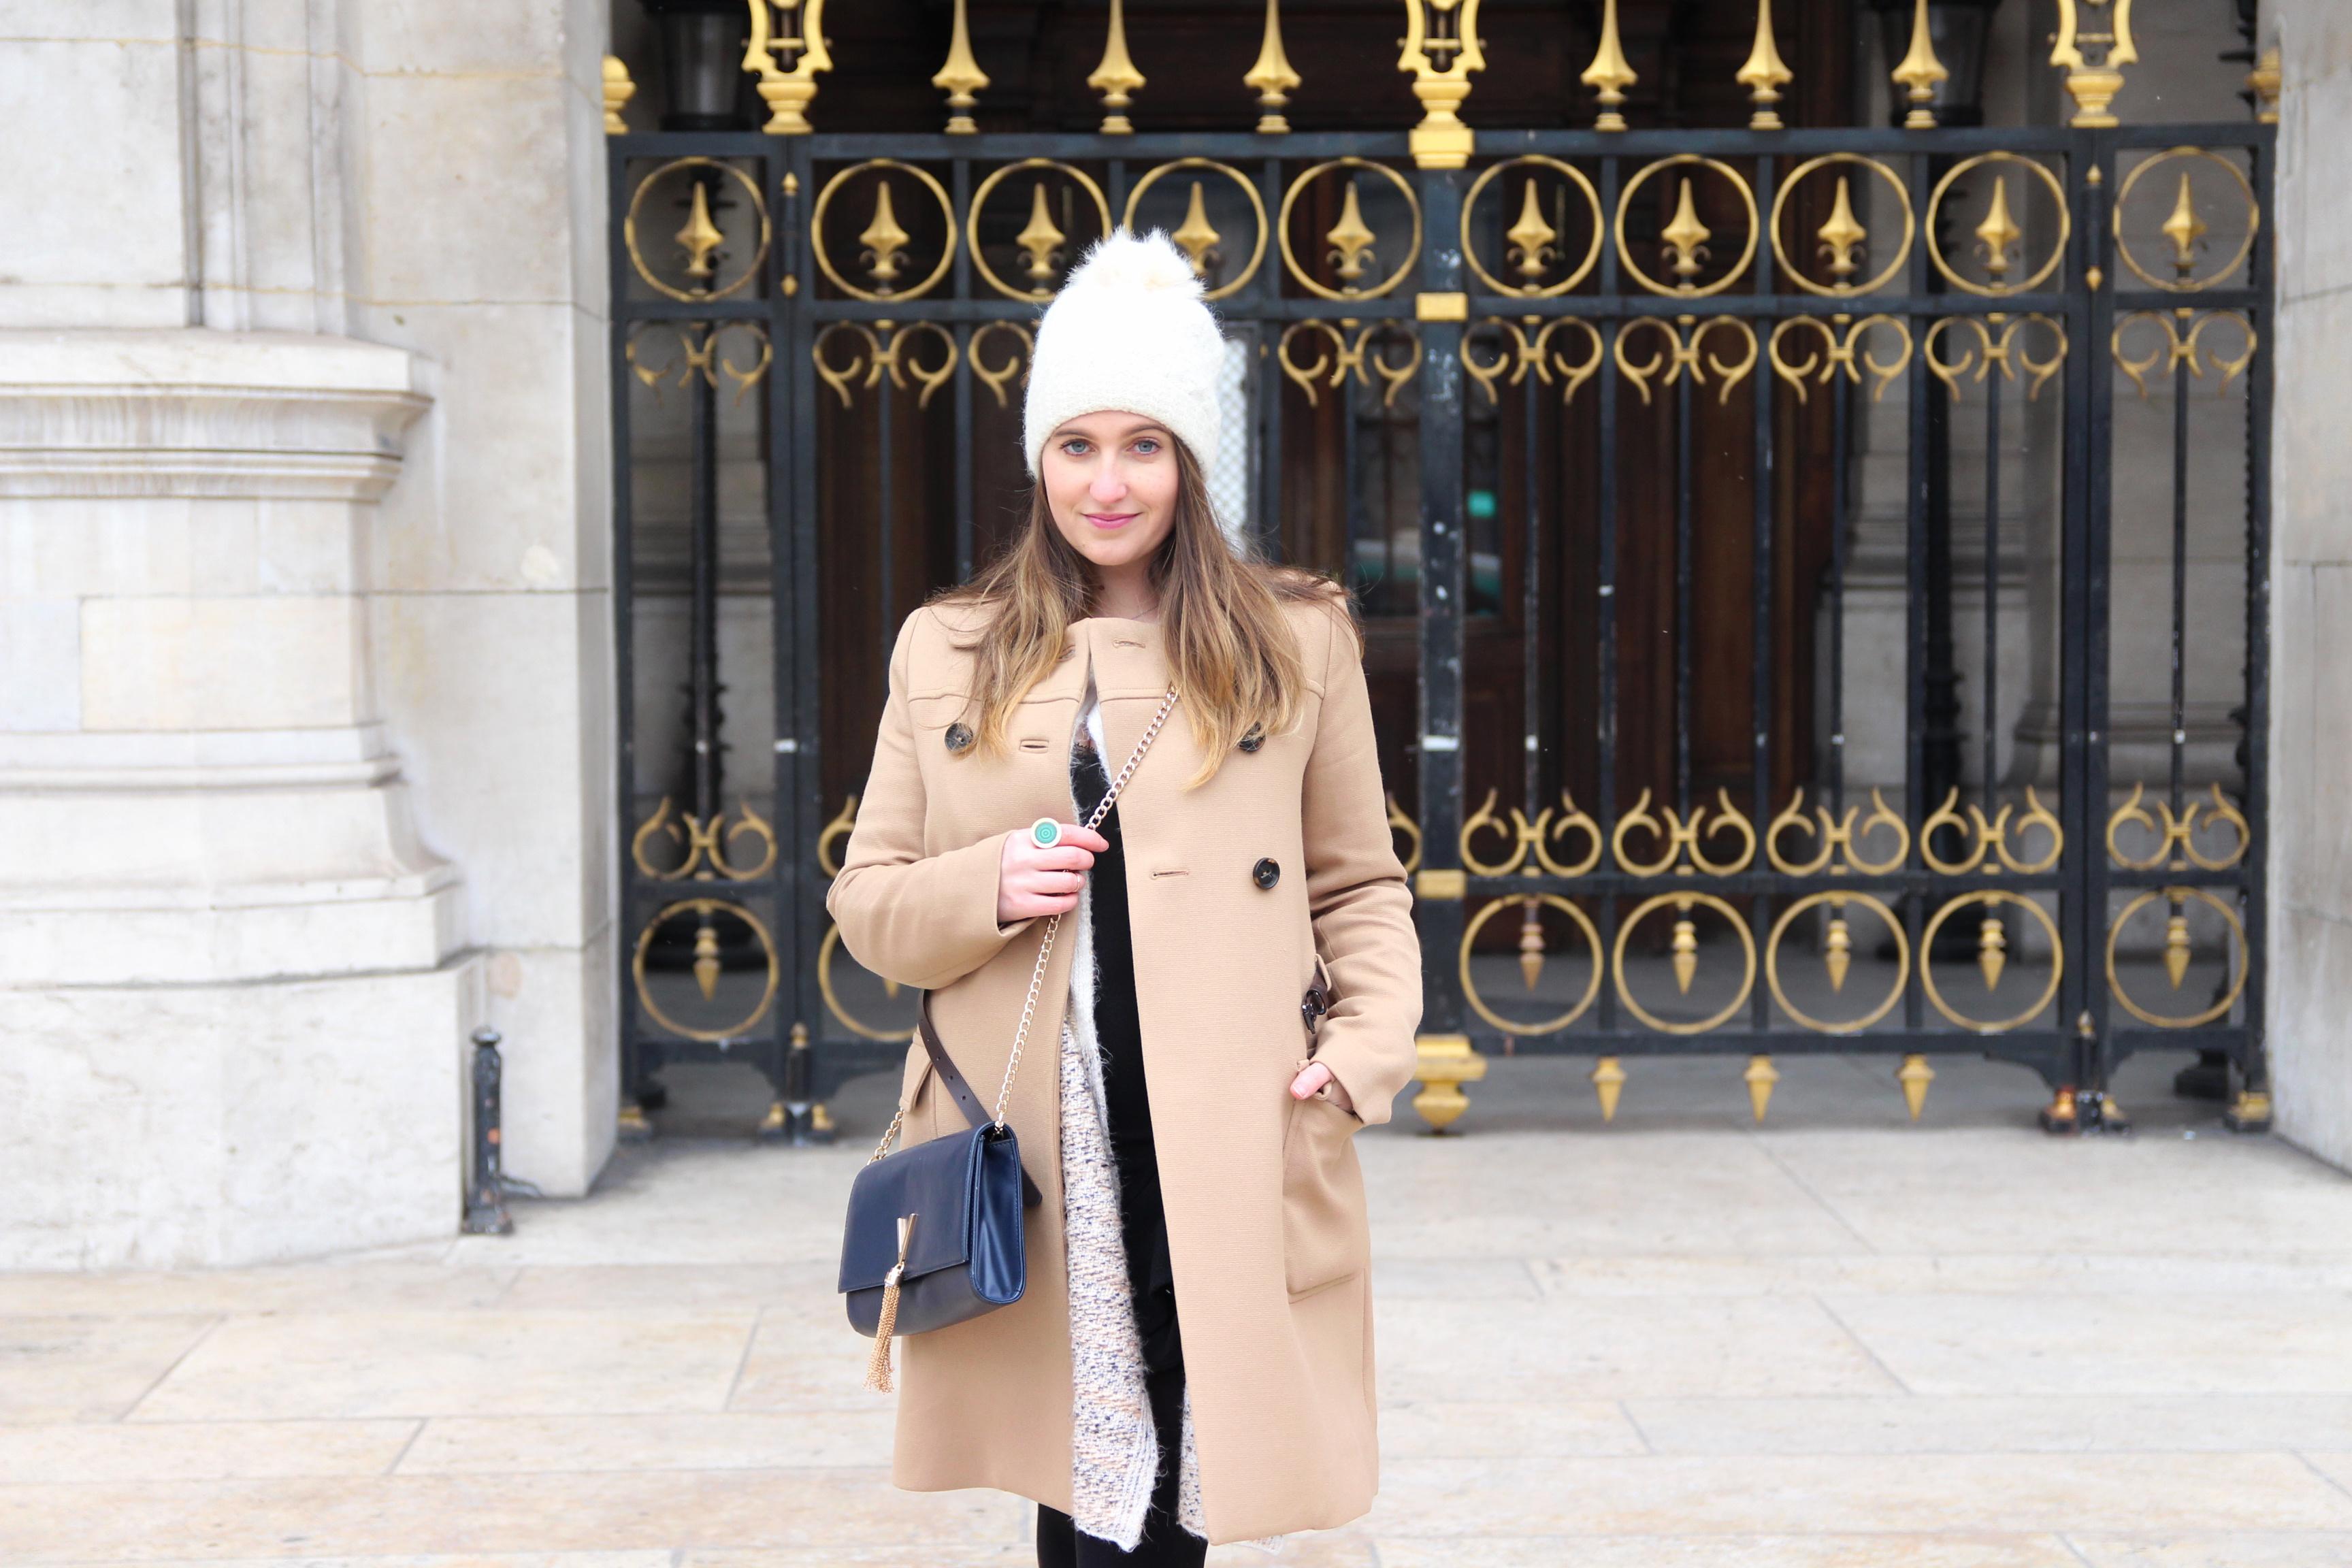 paris-opera-garnier-winter-day-influencer-style-personalstylist-imageconsultant-seralynepointcom-img_6653